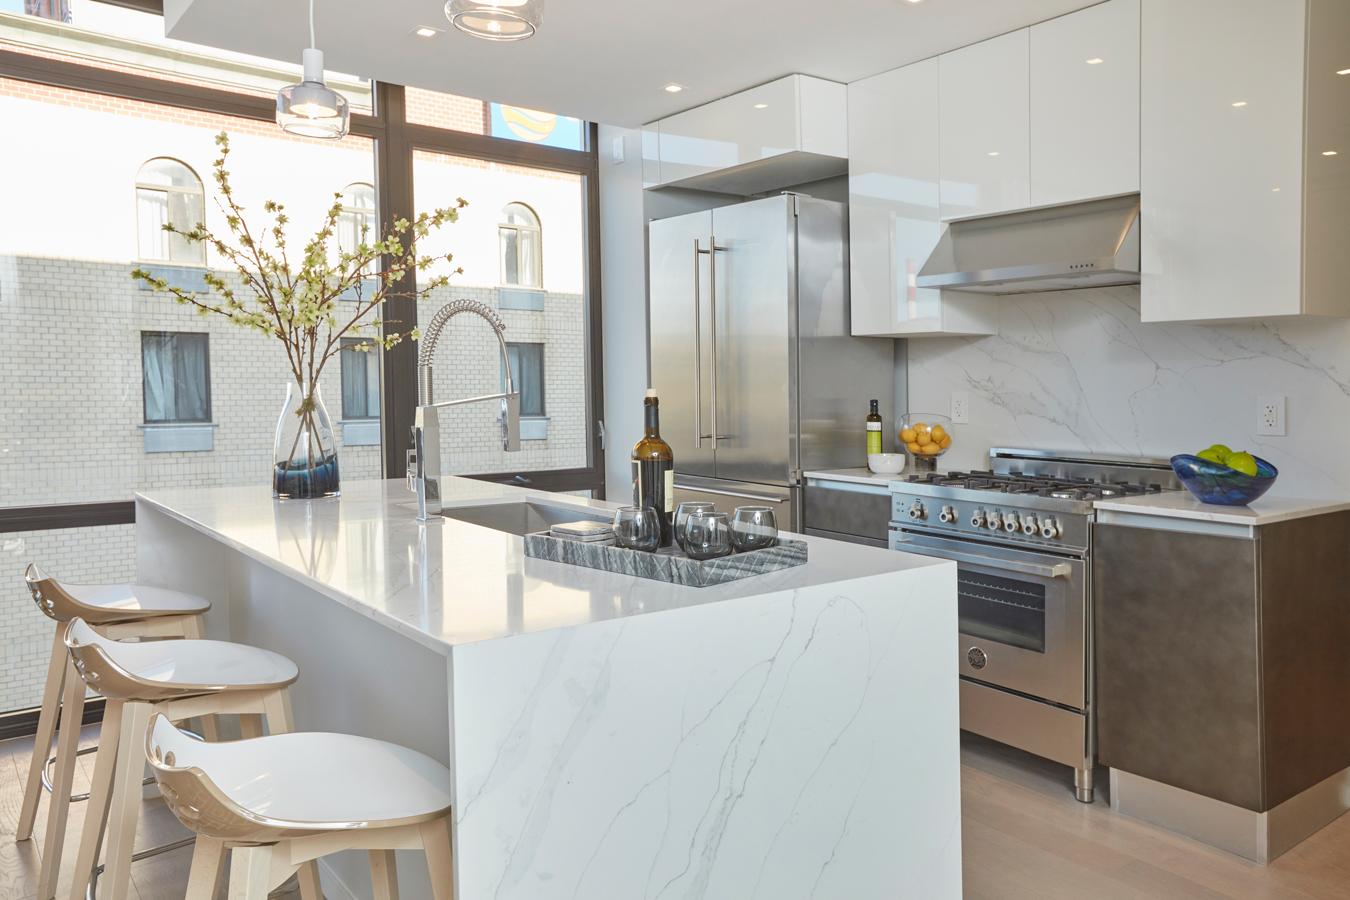 arcadia-lic-kitchen-2.jpg